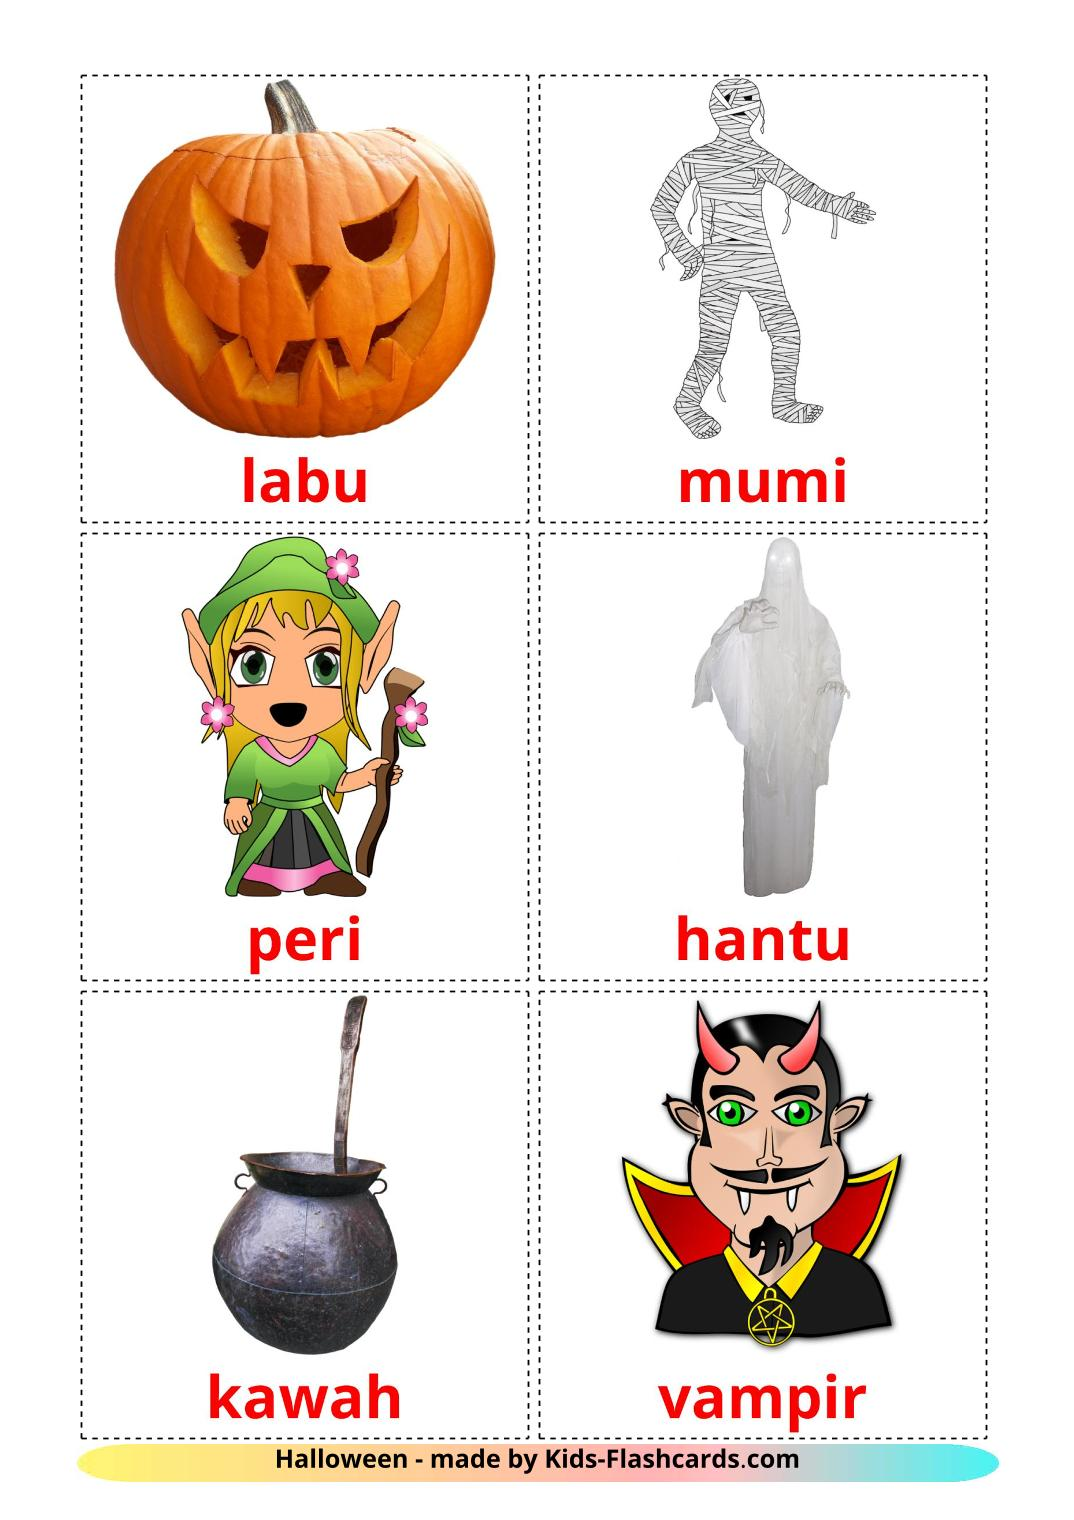 Halloween - 16 Free Printable indonesian Flashcards